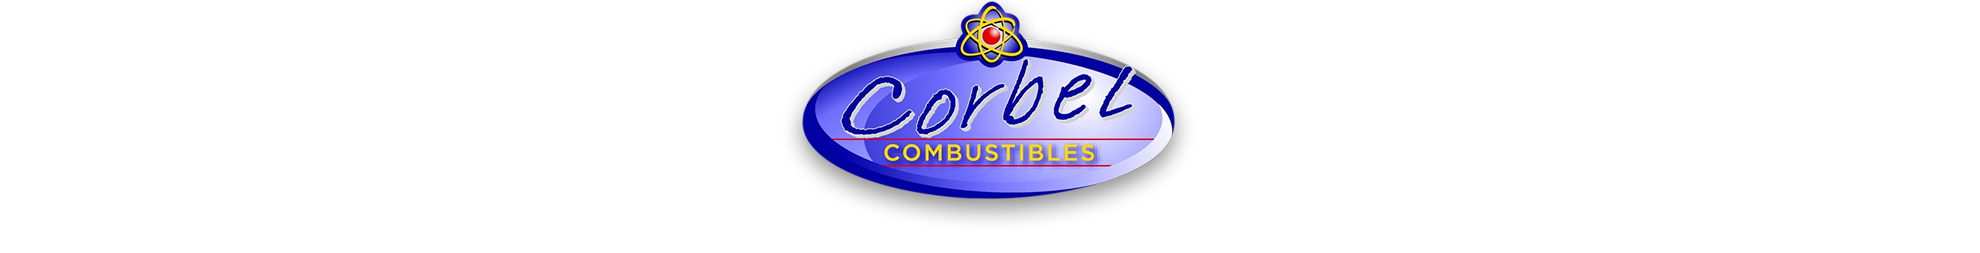 Corbel Combustible